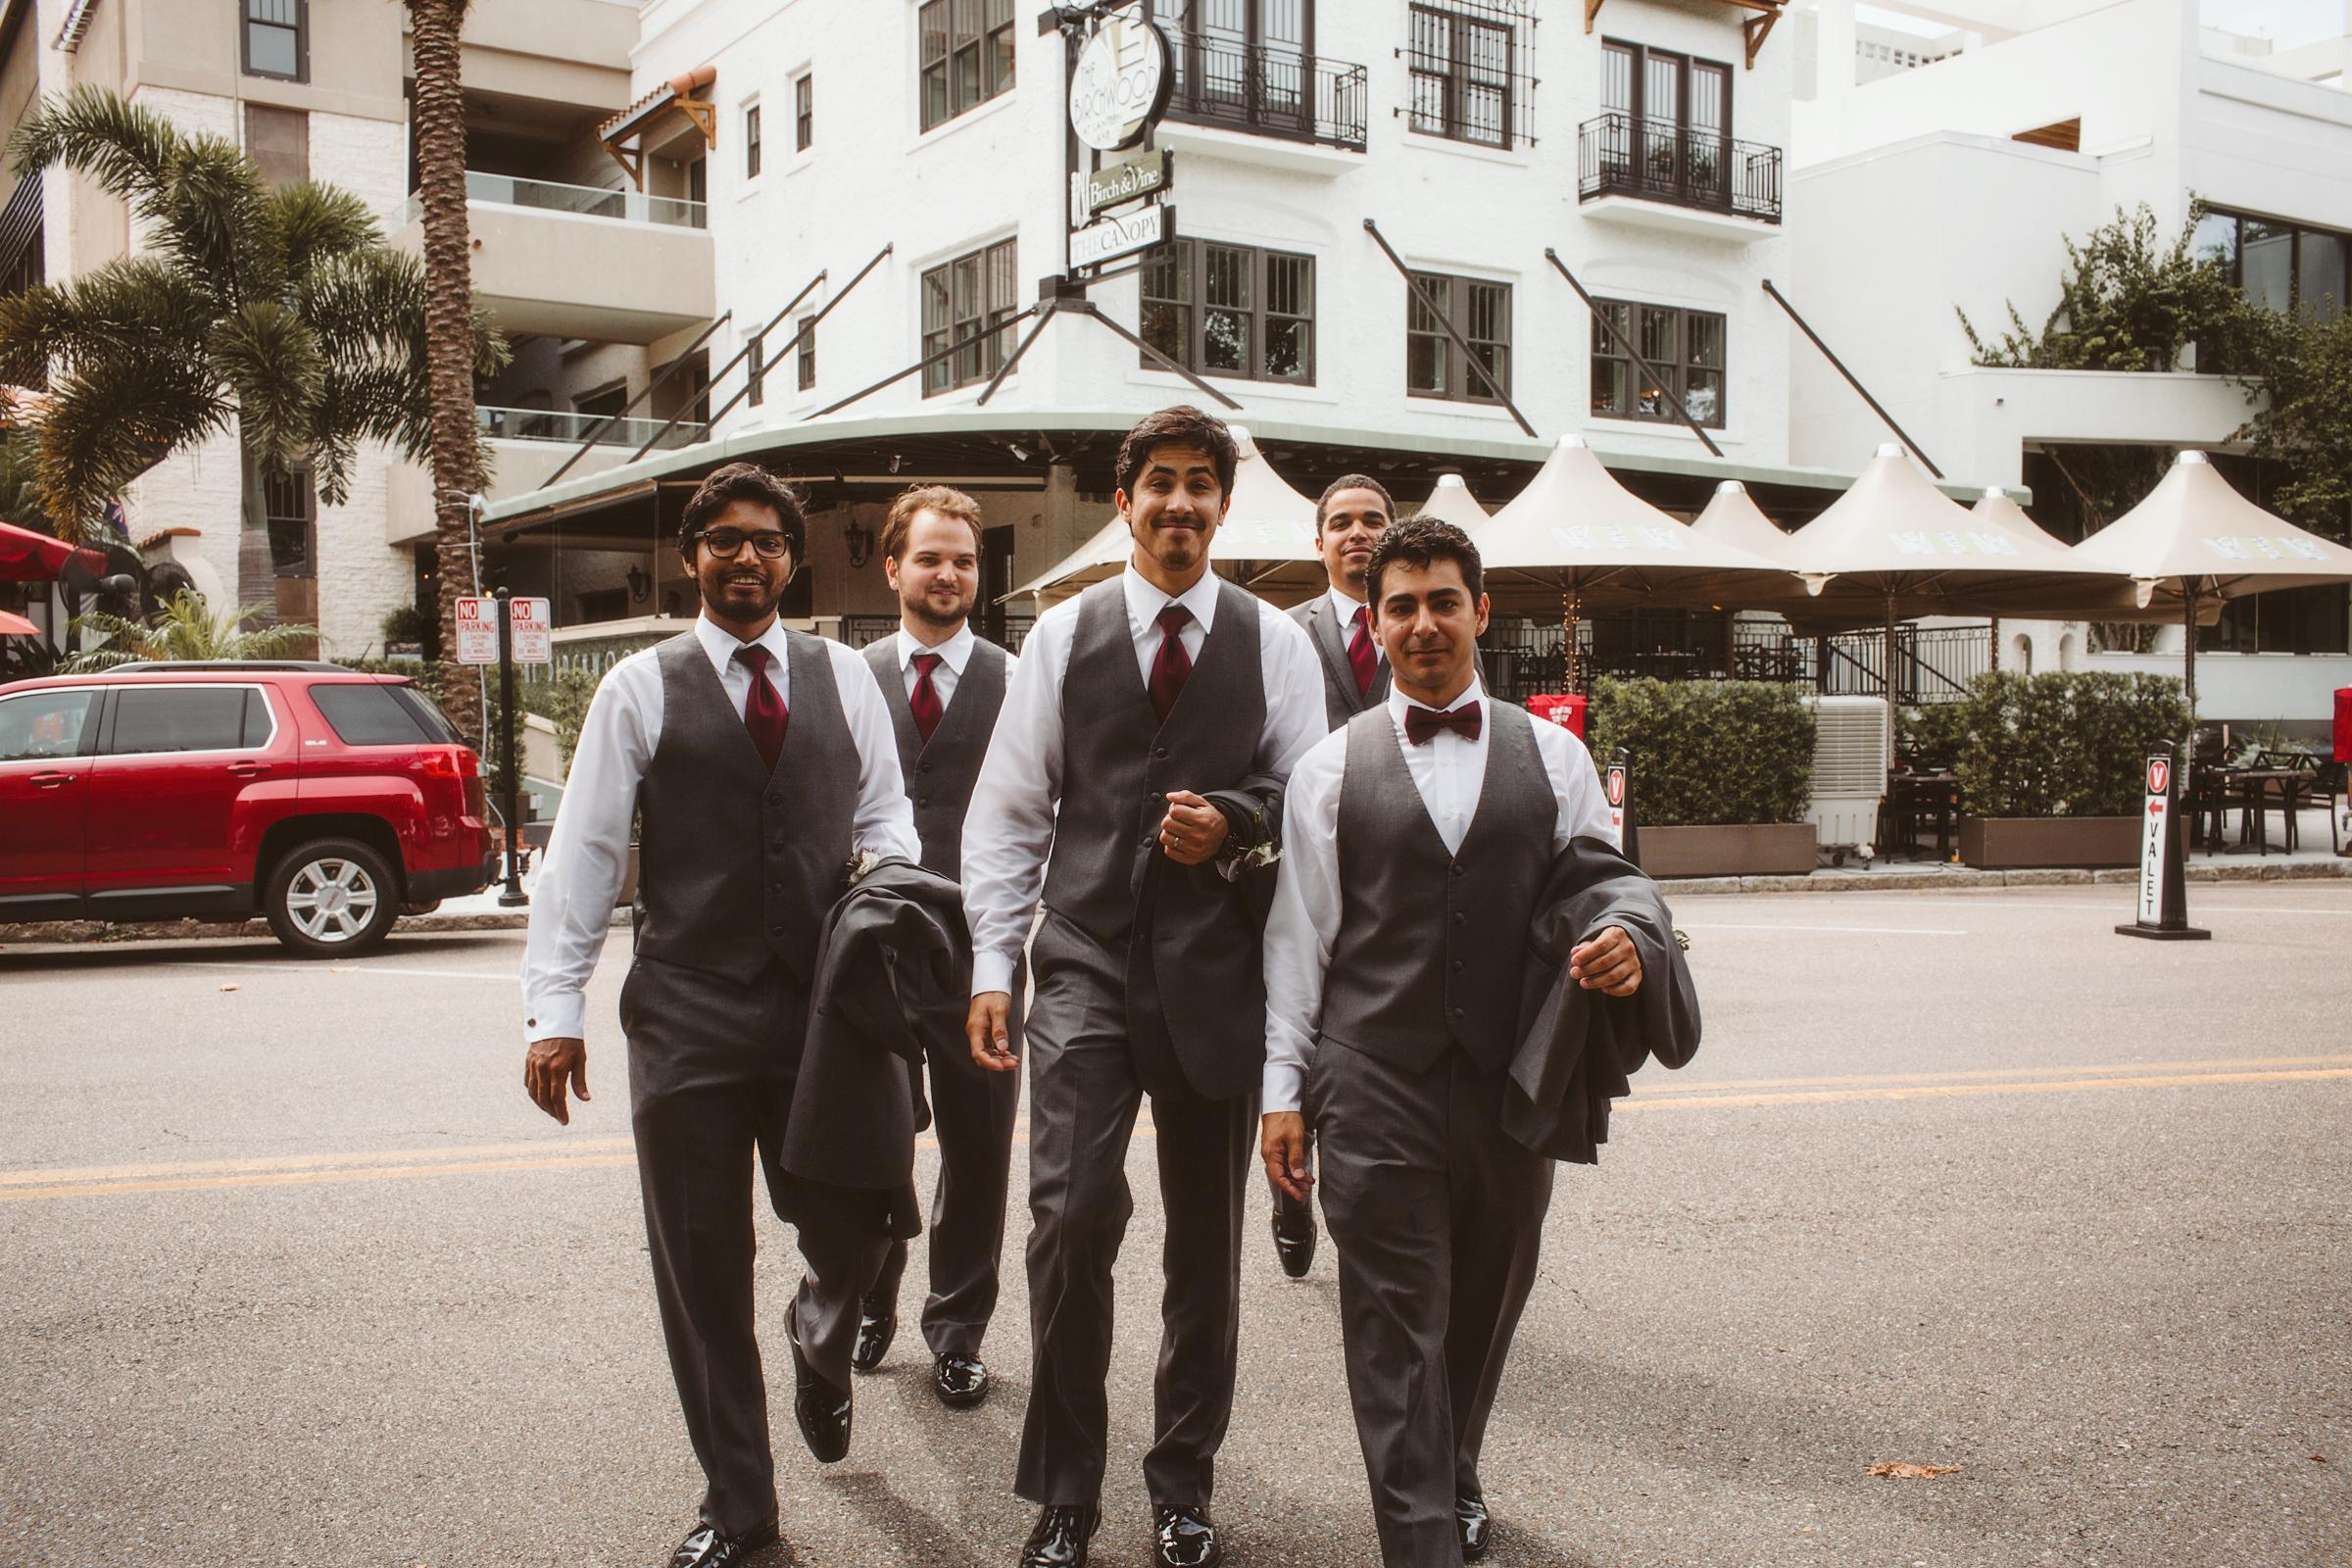 wedding day | MFA St Pete | Vanessa Boy Photography | vanessaboy.com-210.com |final.jpg